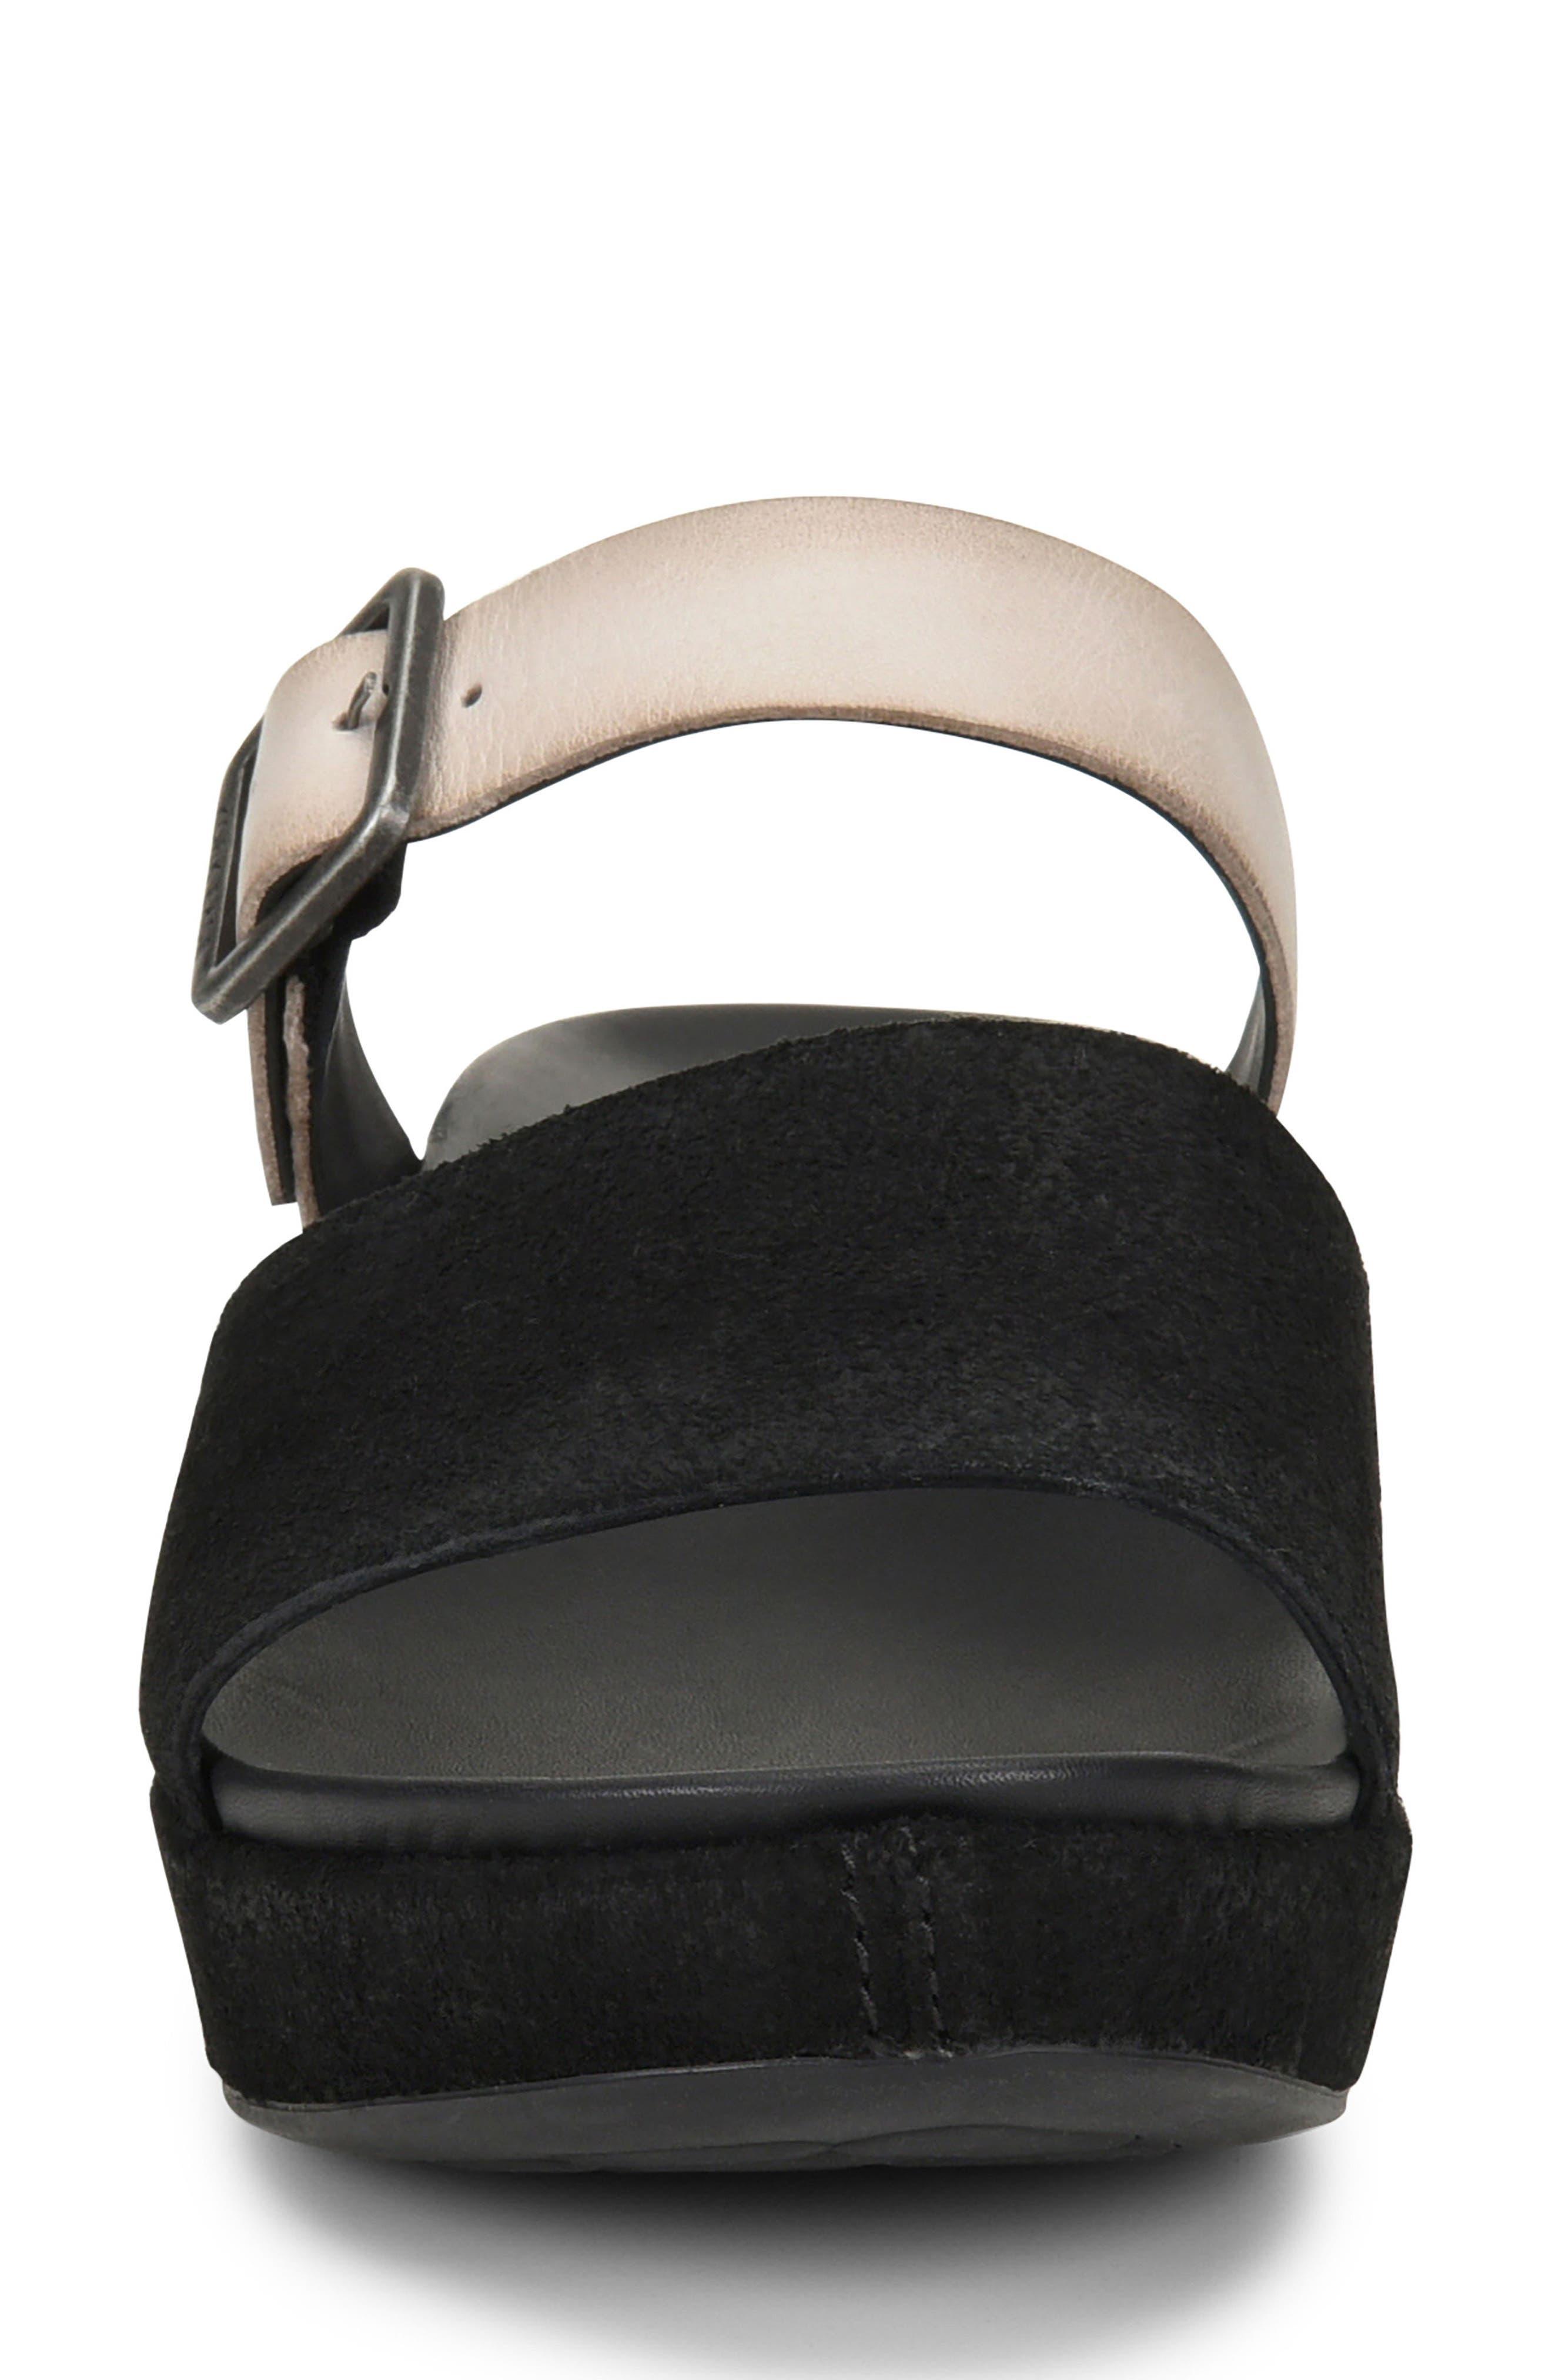 KORK-EASE<SUP>®</SUP>, Bisti Wedge Slide Sandal, Main thumbnail 1, color, BLACK/ GREY LEATHER